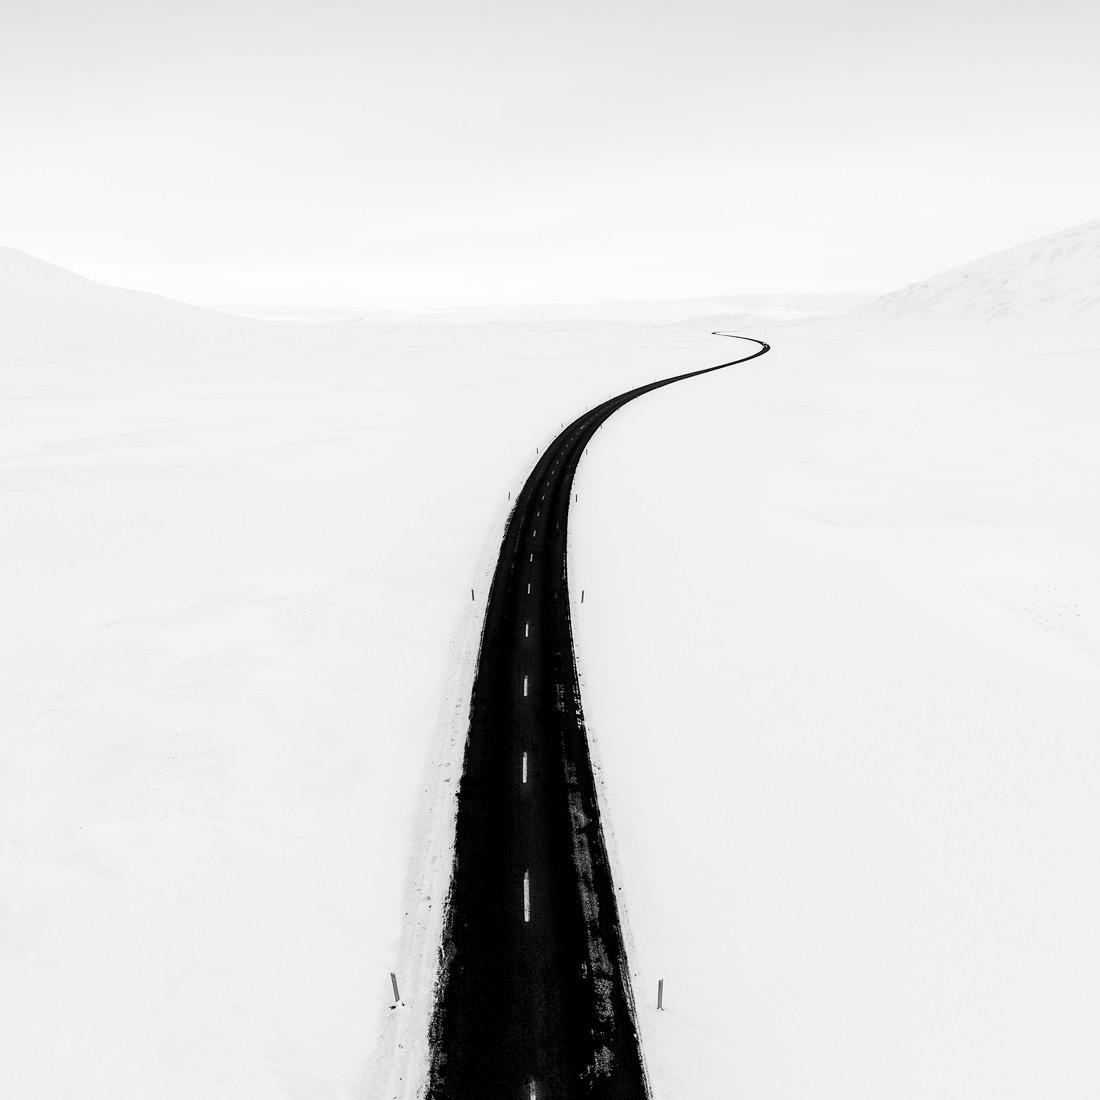 1-е место Black and White Minimalist Photography Prize 2020–2021. Дорога в Исландии. Фотограф Тим Невелл